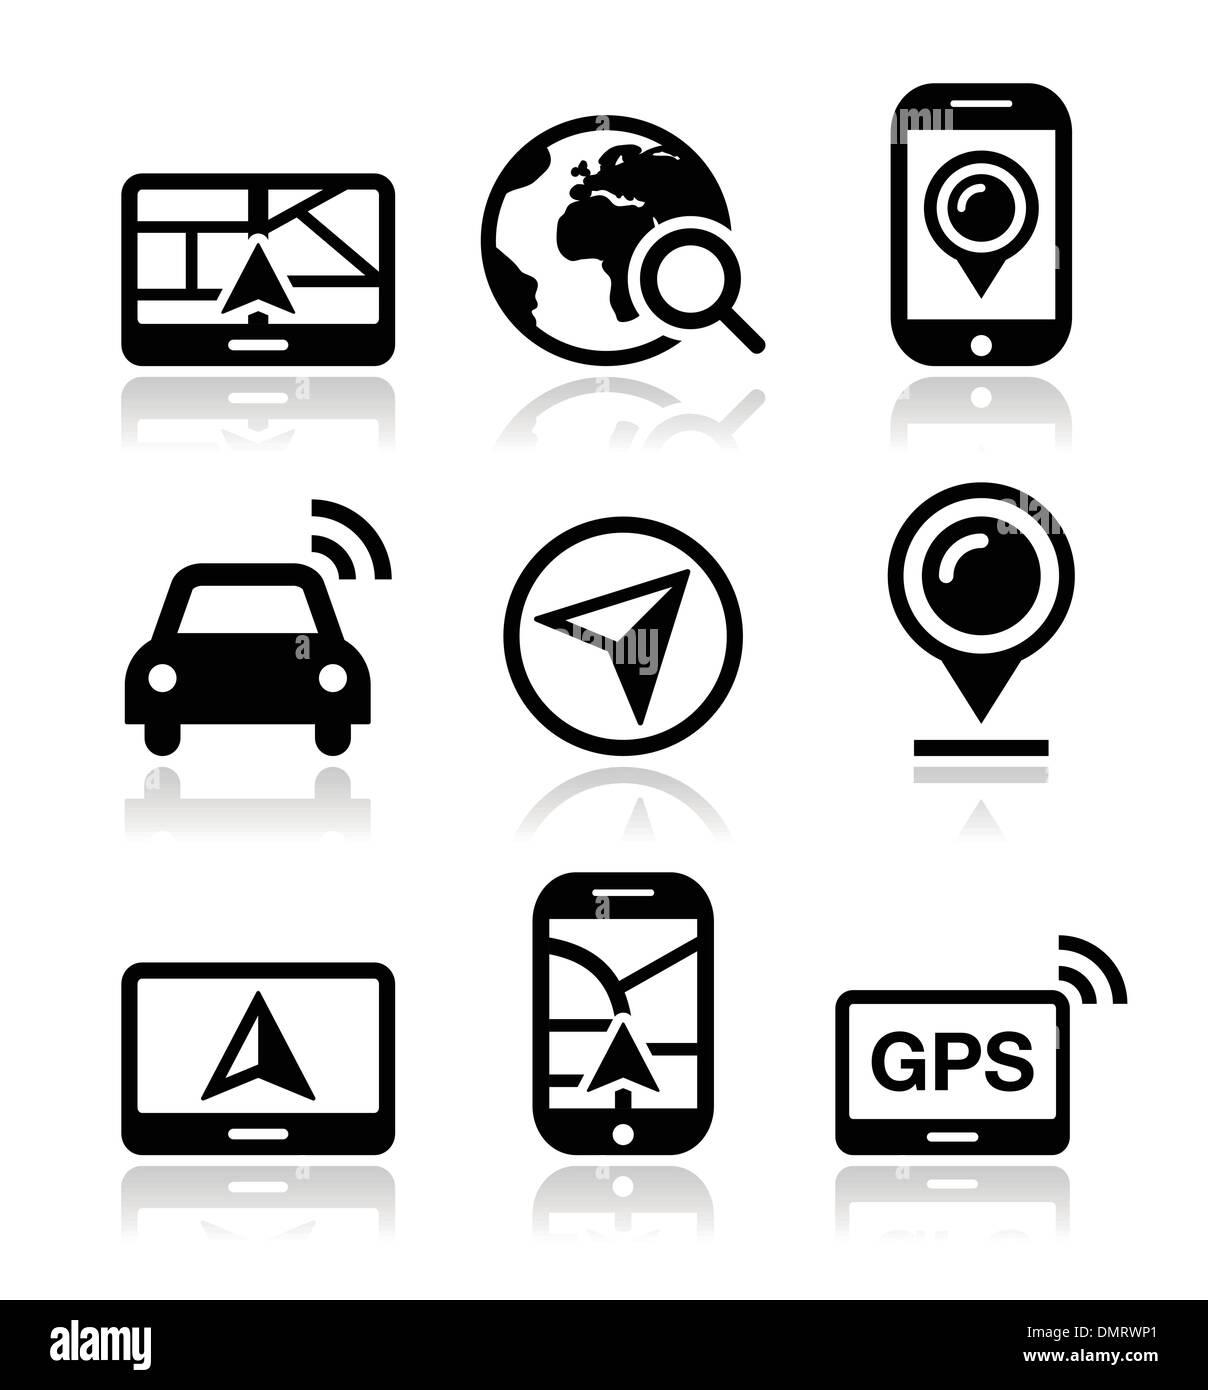 GPS, navigation travel vector icons set - Stock Image